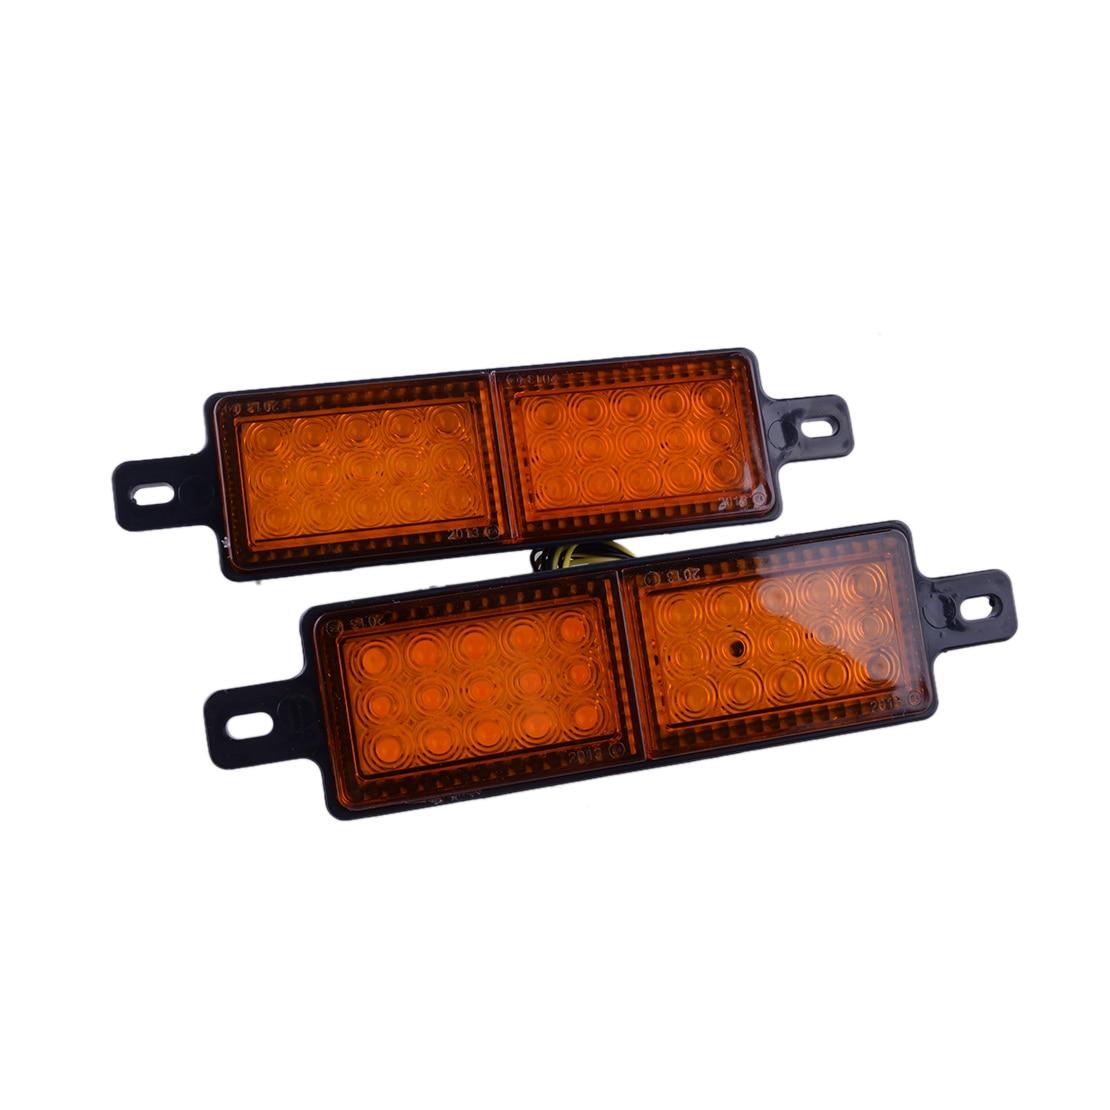 2Pcs Universal 12V 30 LED Amber Front Indicator Park Light Bull Bar Marker Lamp for Pickup Truck Trailer Boat Lorry Van Caravan